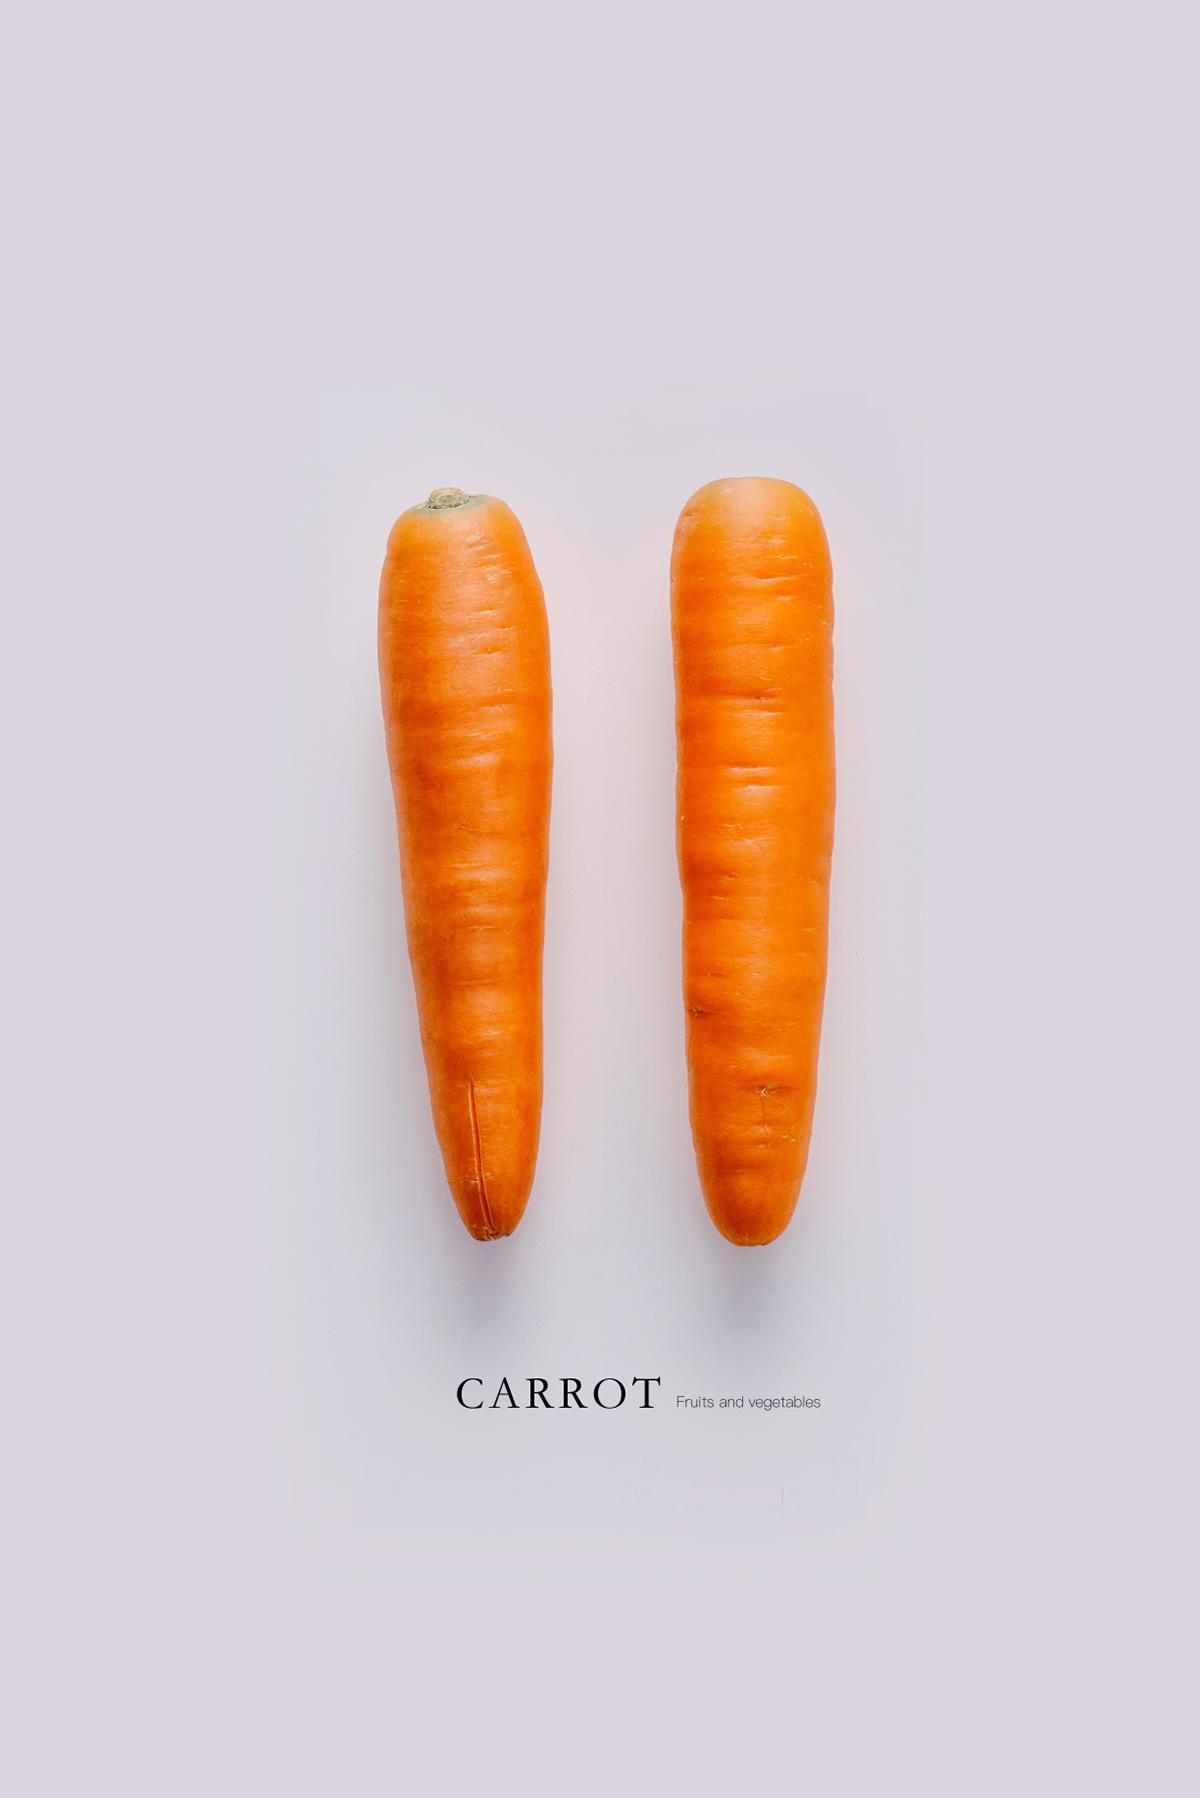 whole fruits &vegetables food photo Life Style Photo